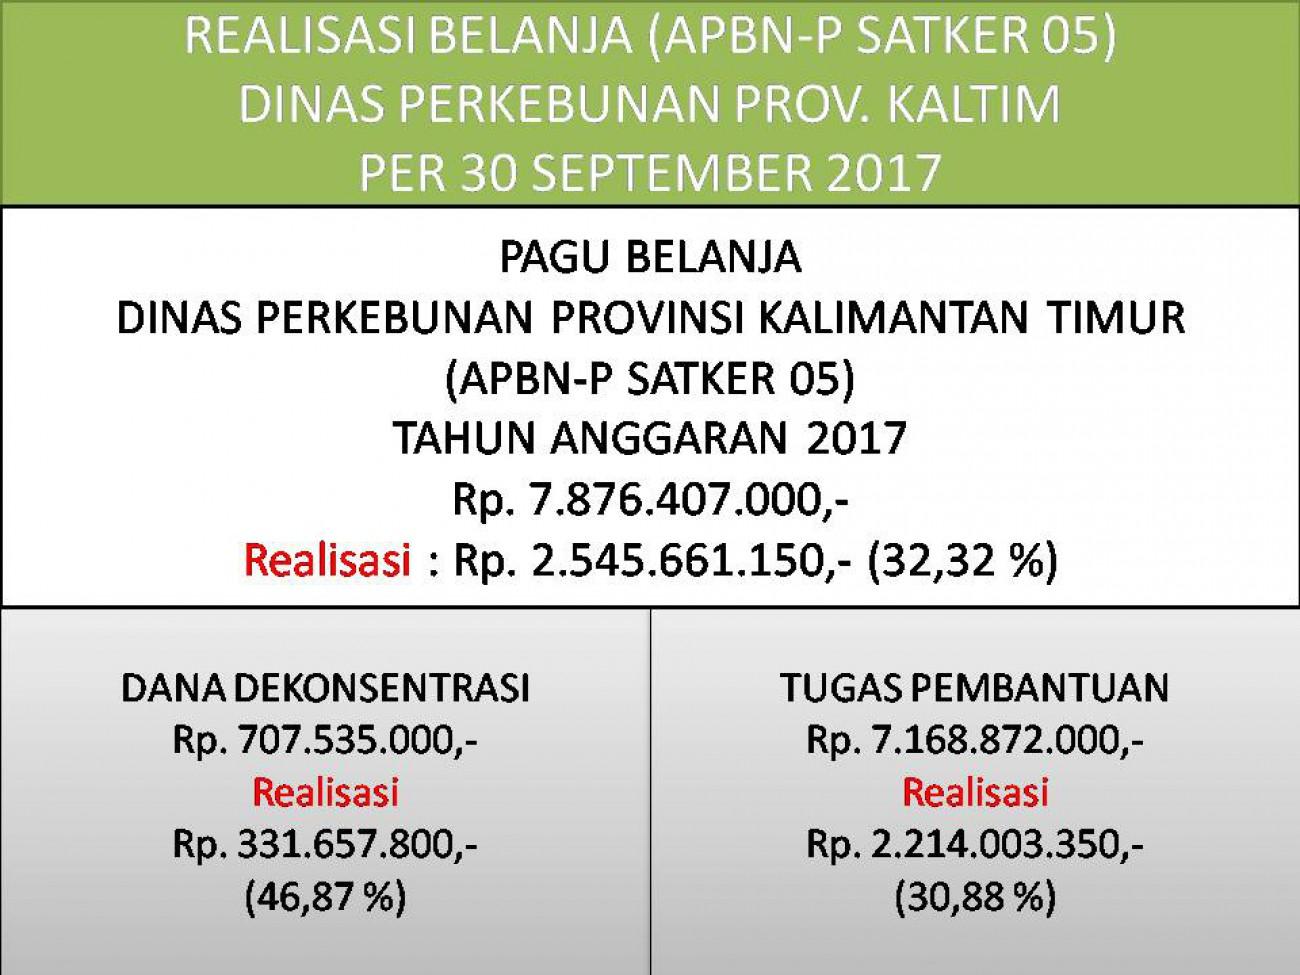 Laporan Realisasi APBN-P Satker 05 (Direktorat Jenderal Perkebunan) Dinas Perkebunan Prov. Kaltim Bulan September 2017